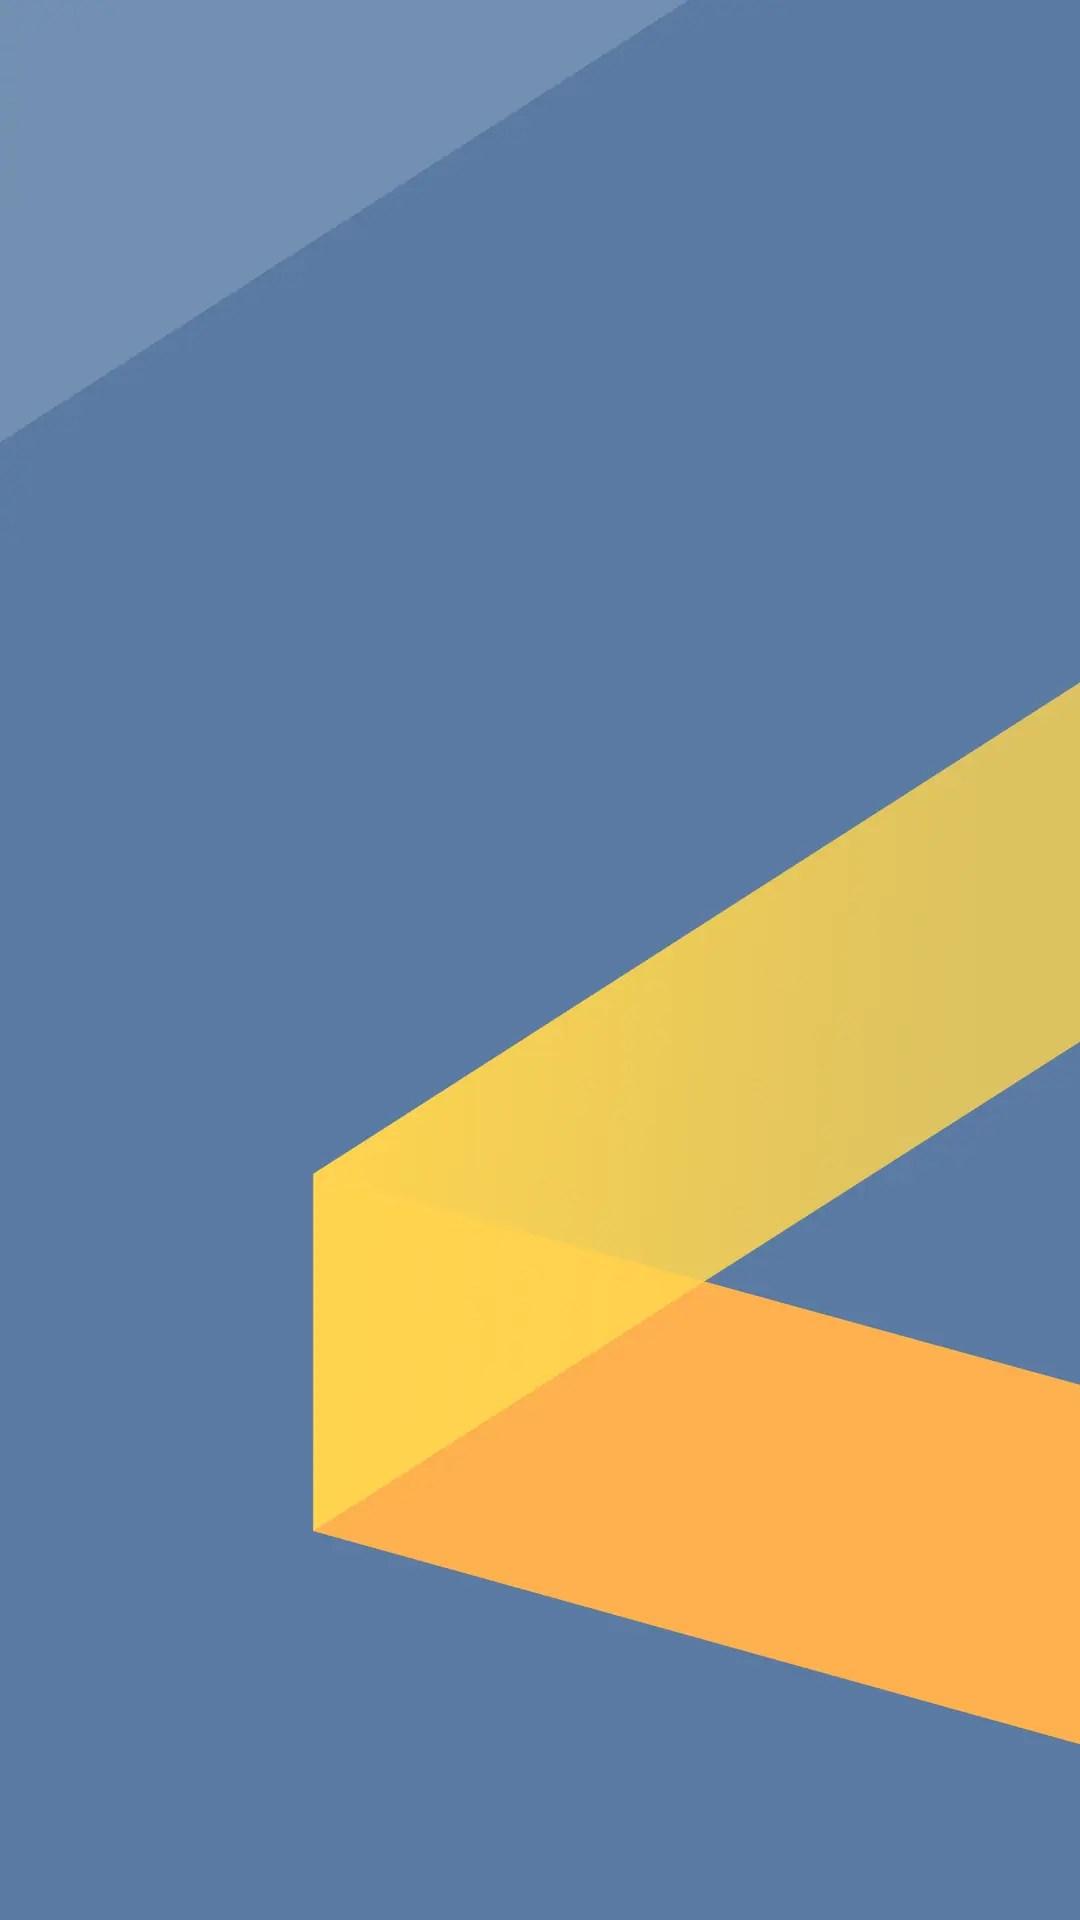 ribbon OnePlus 2 Wallpapers